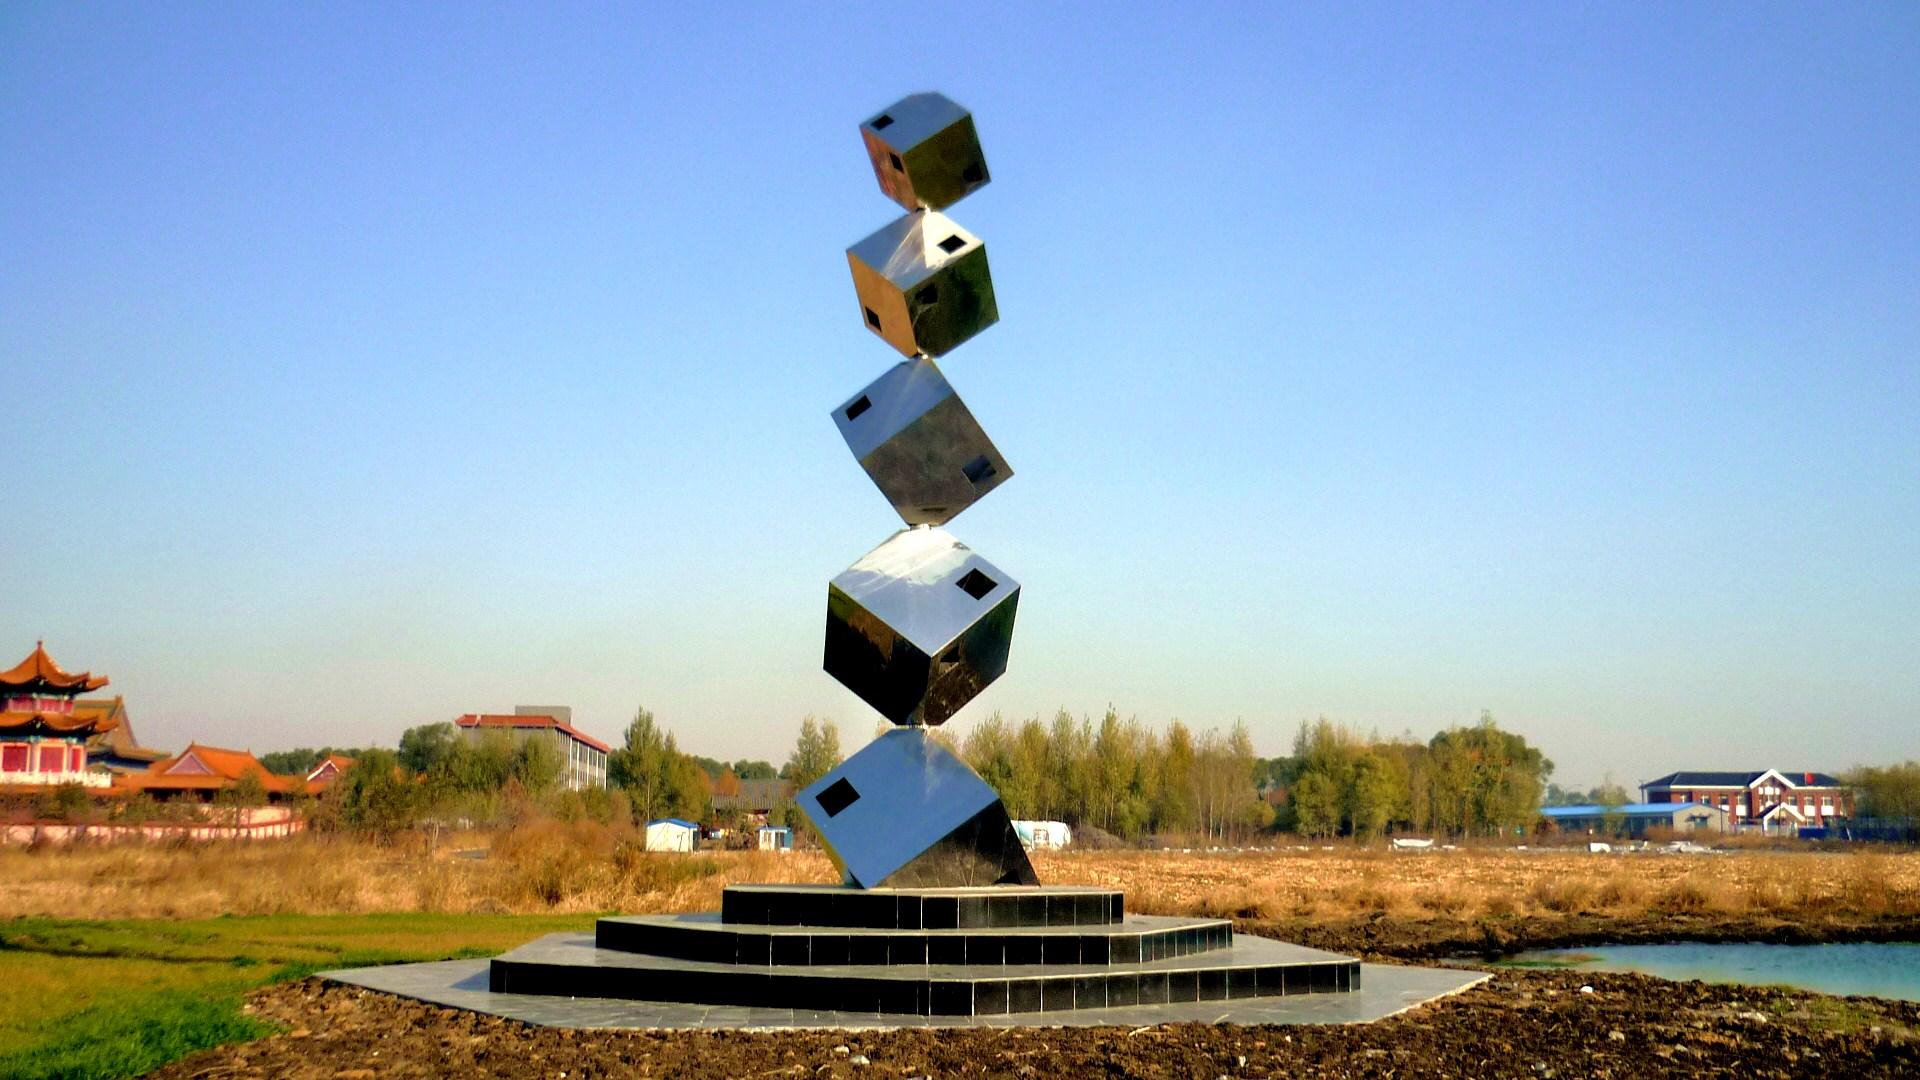 Ralfonso - Qube Tower - Changchun (101).jpg